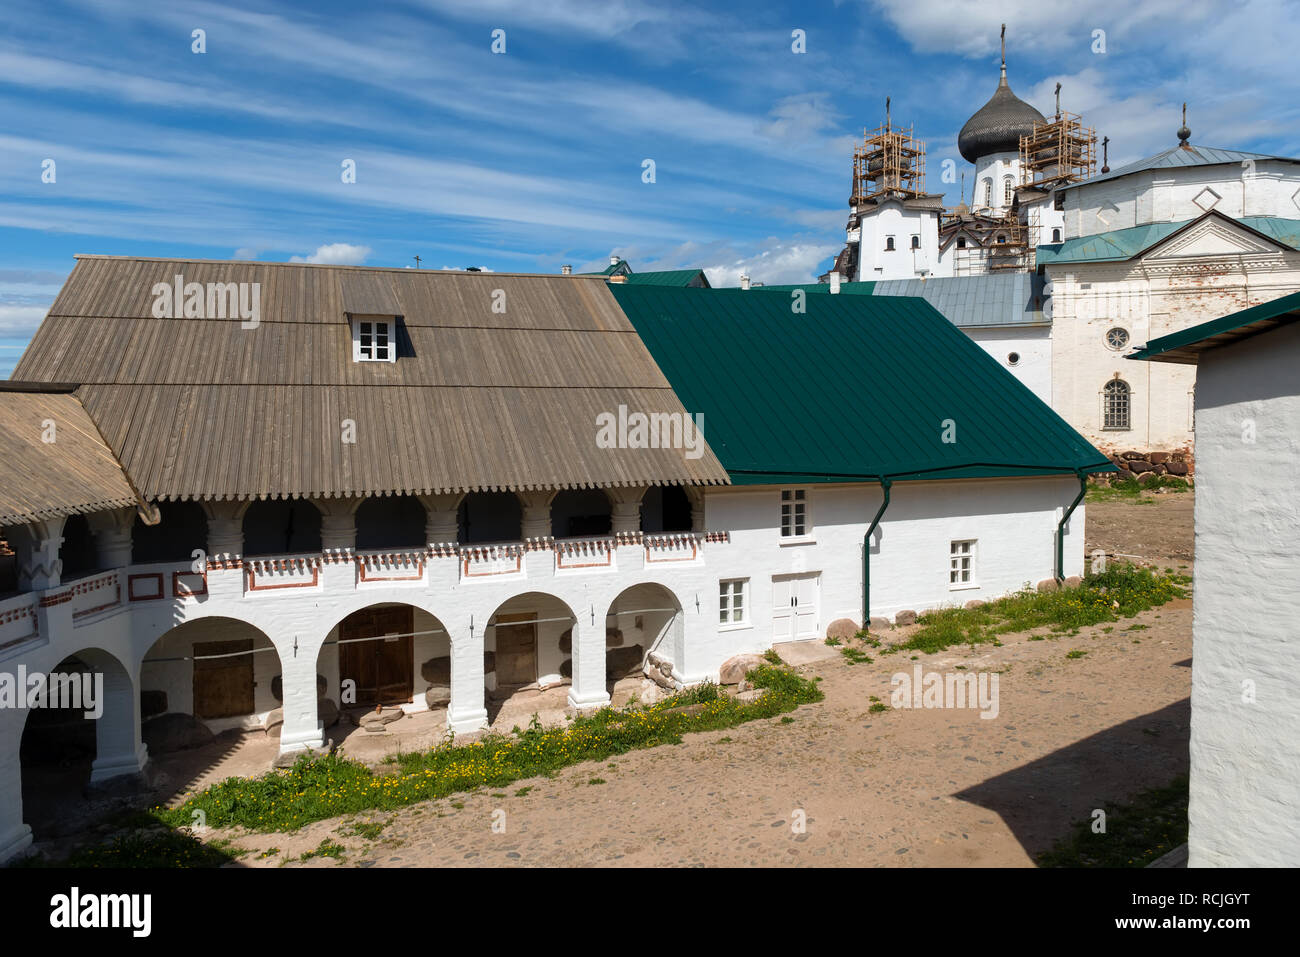 SOLOVKI, REPUBLIC OF KARELIA, RUSSIA - JUNE 27, 2018: View of the mill  In the Spaso-Preobrazhensky Solovetsky Monastery. Russia, Arkhangelsk region,  Stock Photo